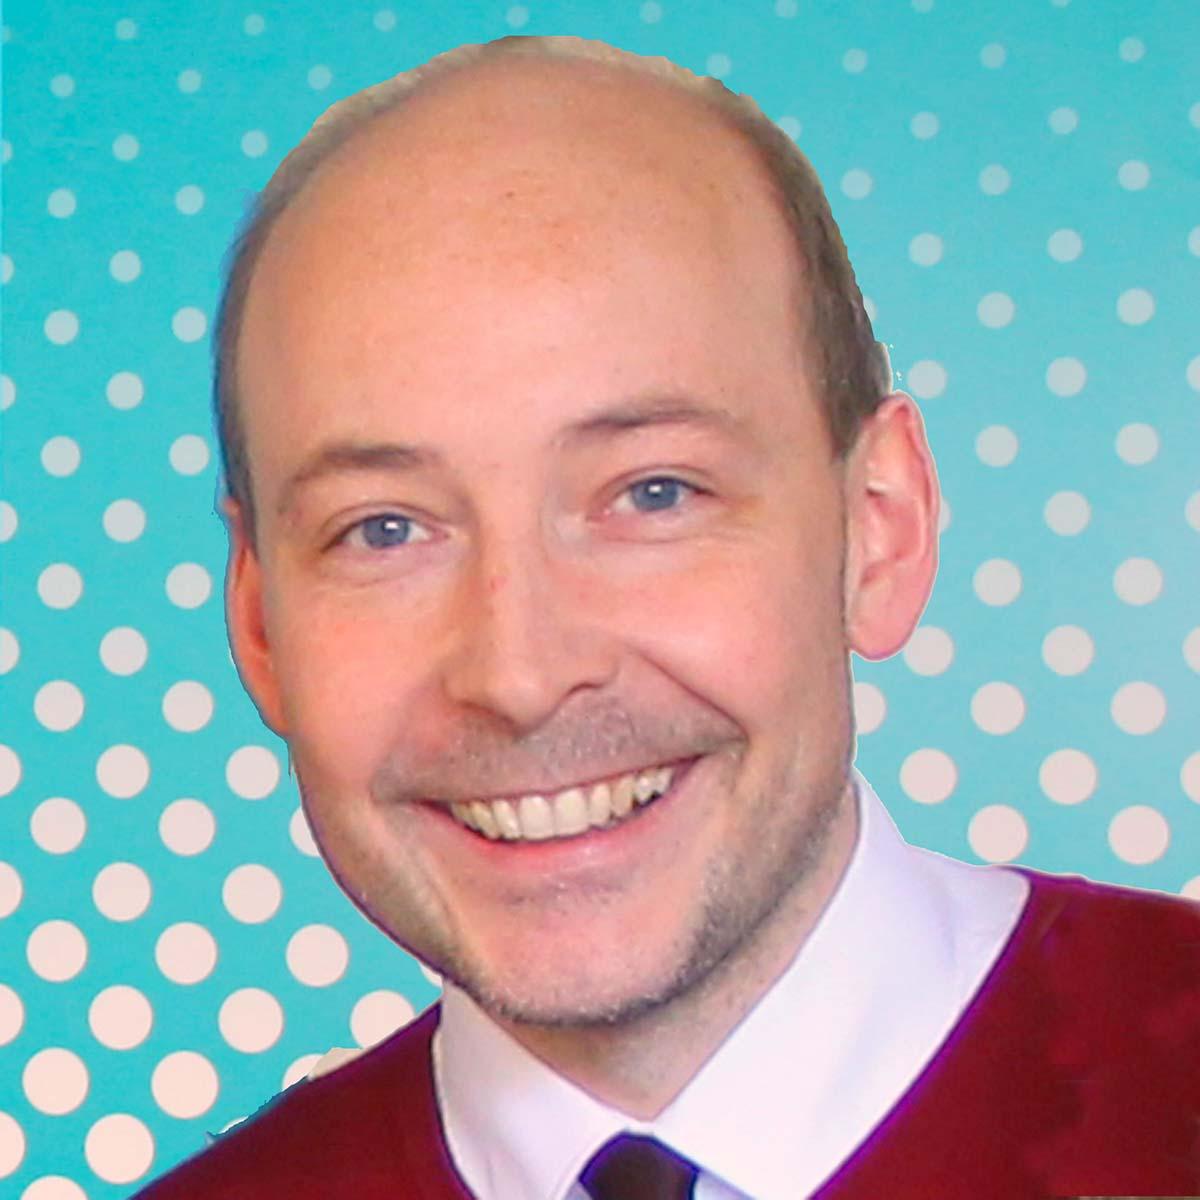 Projektleiter: Dr. Markus Ehm